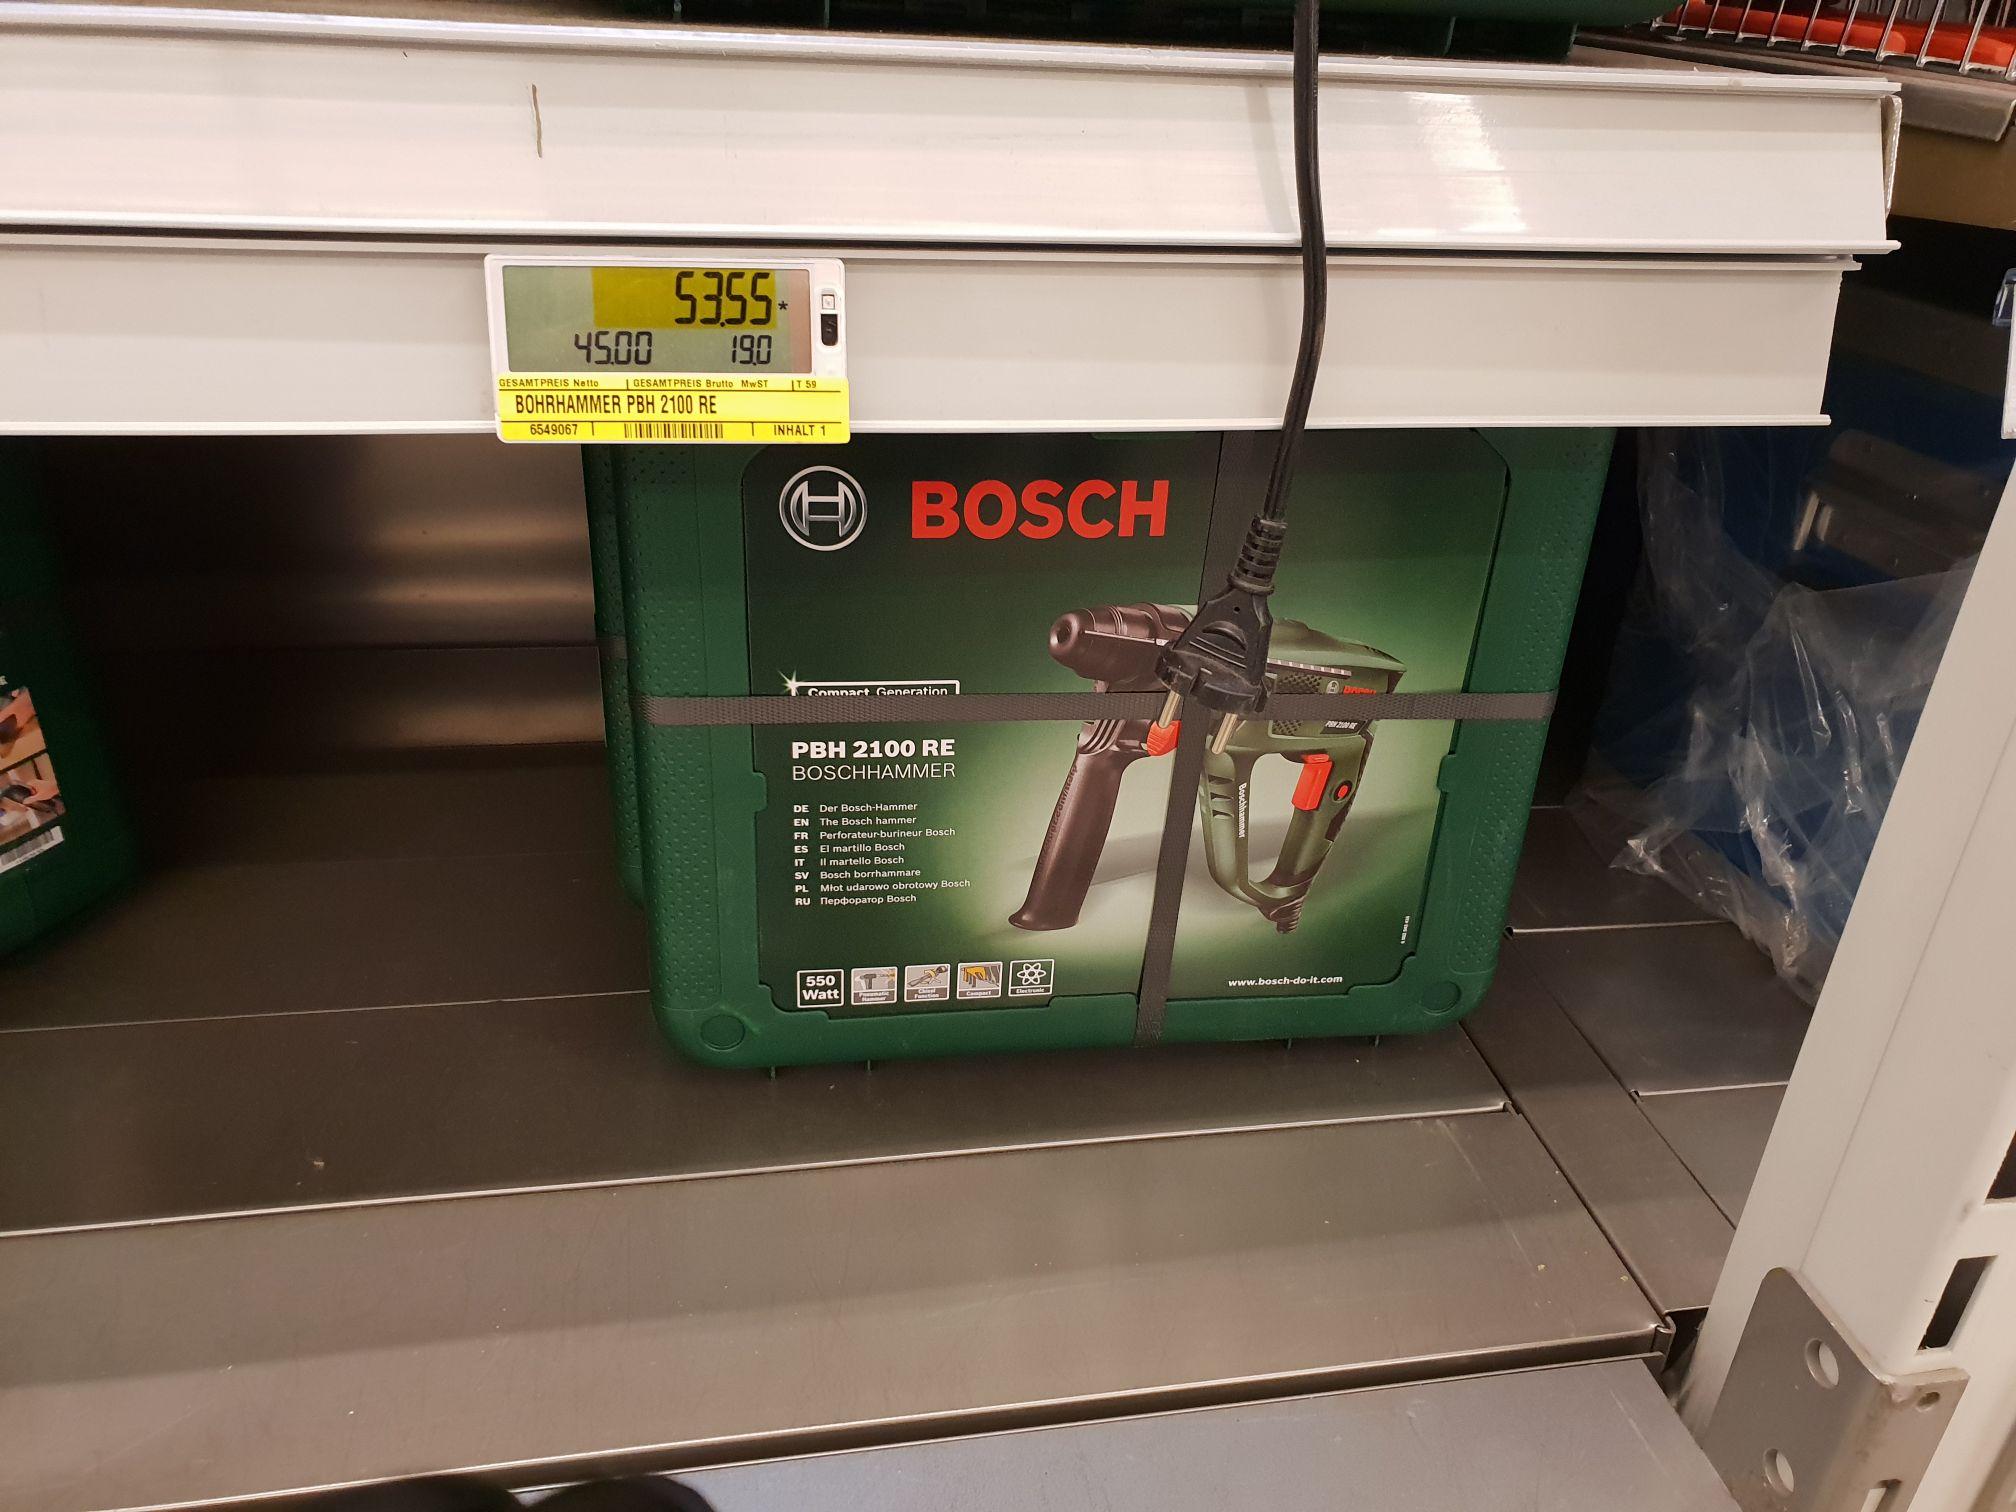 Bosch PBH 2100 RE Bohrhammer im Koffer [lokal Metro Berlin] Netto 45€